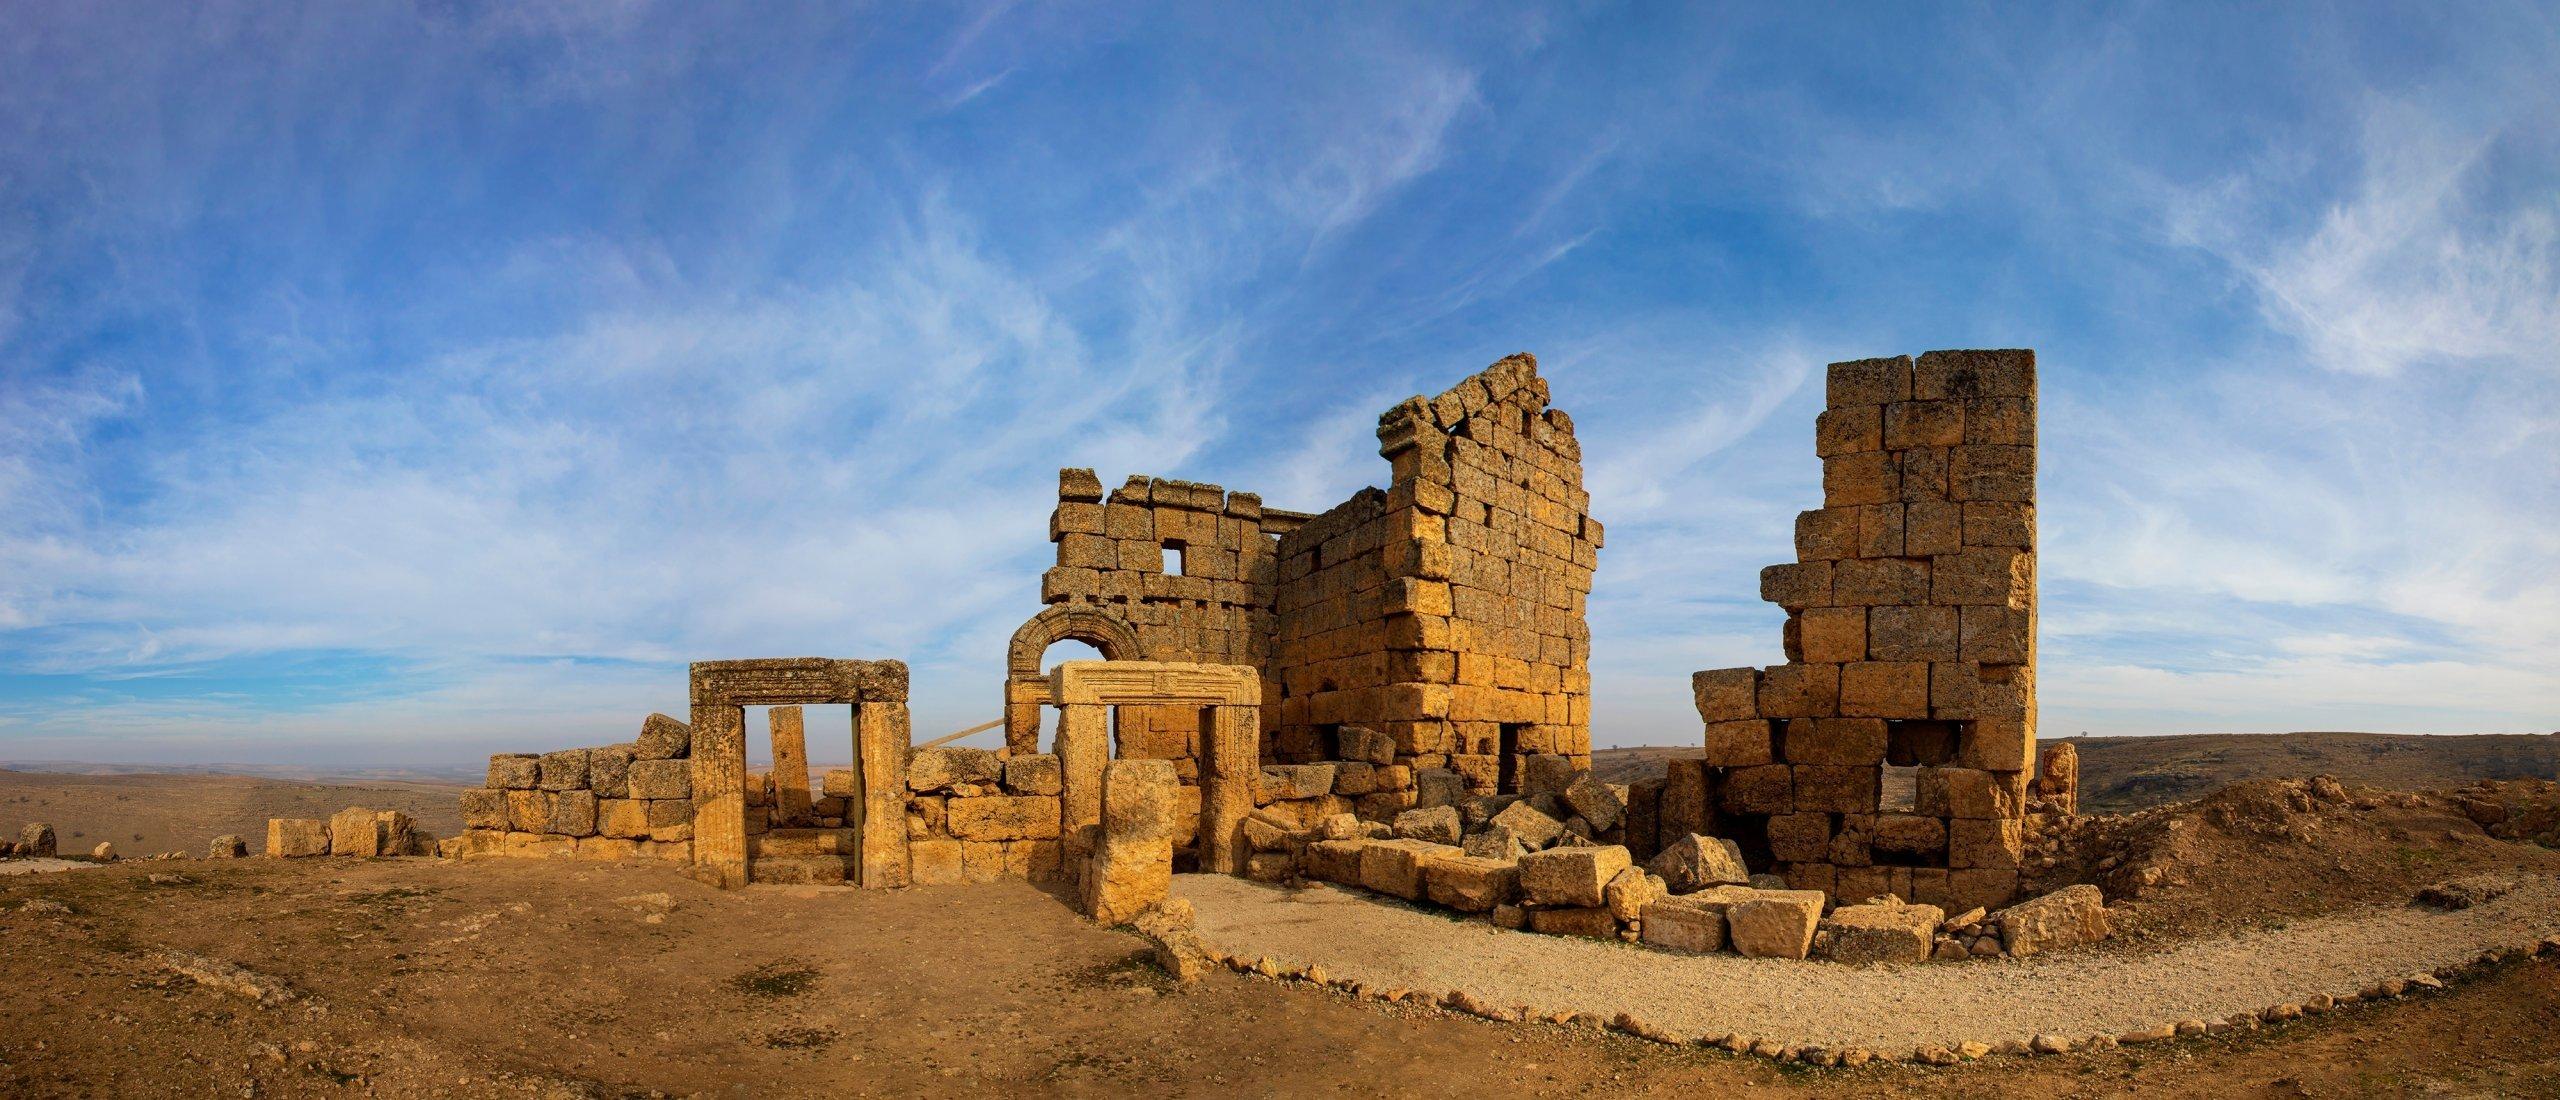 A panoramic view of the church ruins in Zerzevan Castle in Diyarbakır, southeastern Turkey. (Shutterstock Photo)